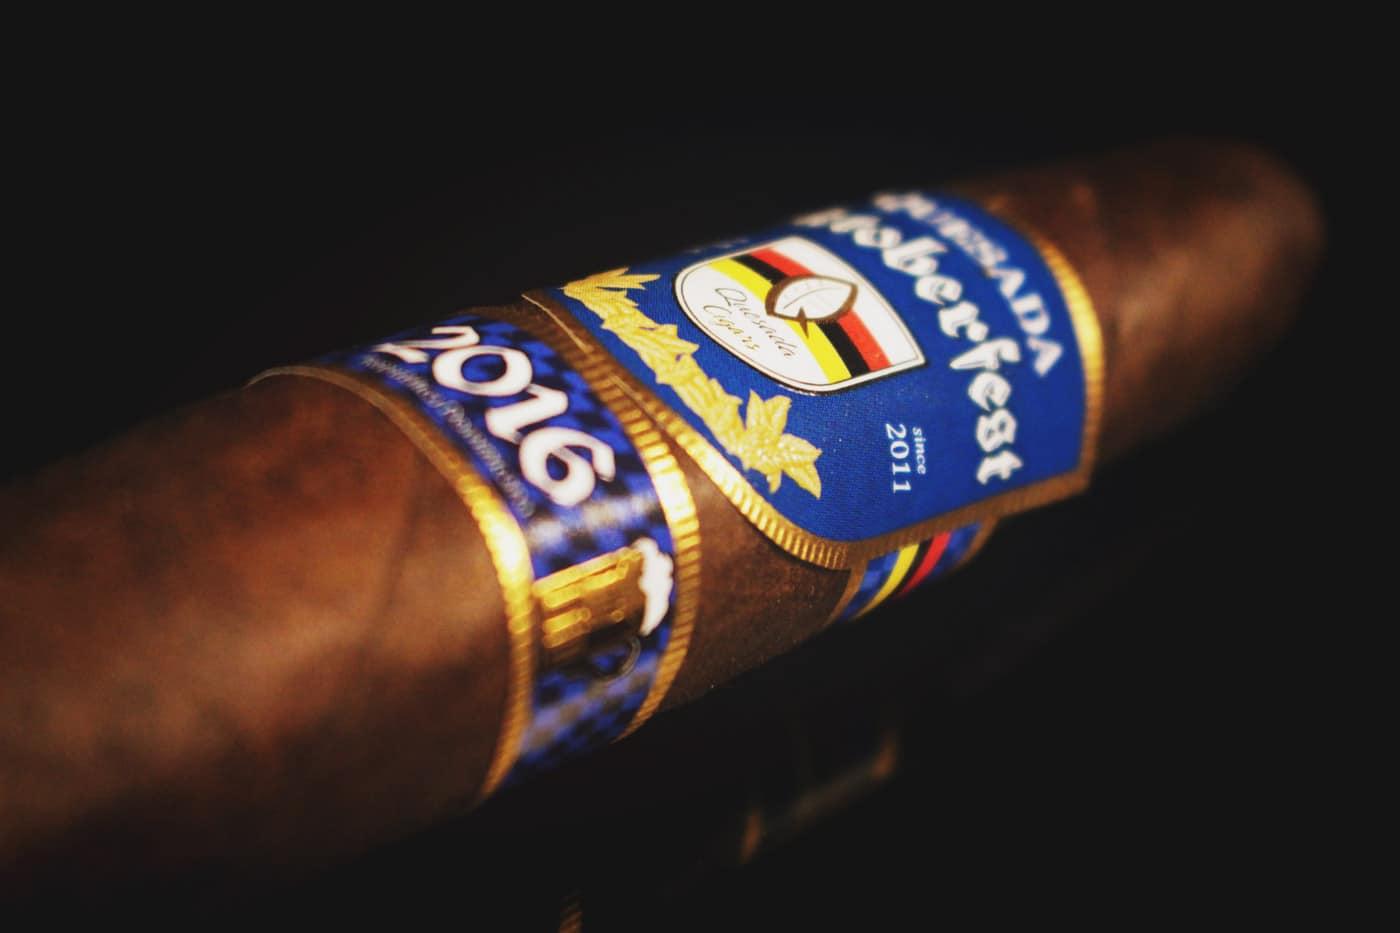 Quesada Oktoberfest 2016 Kugel cigar review